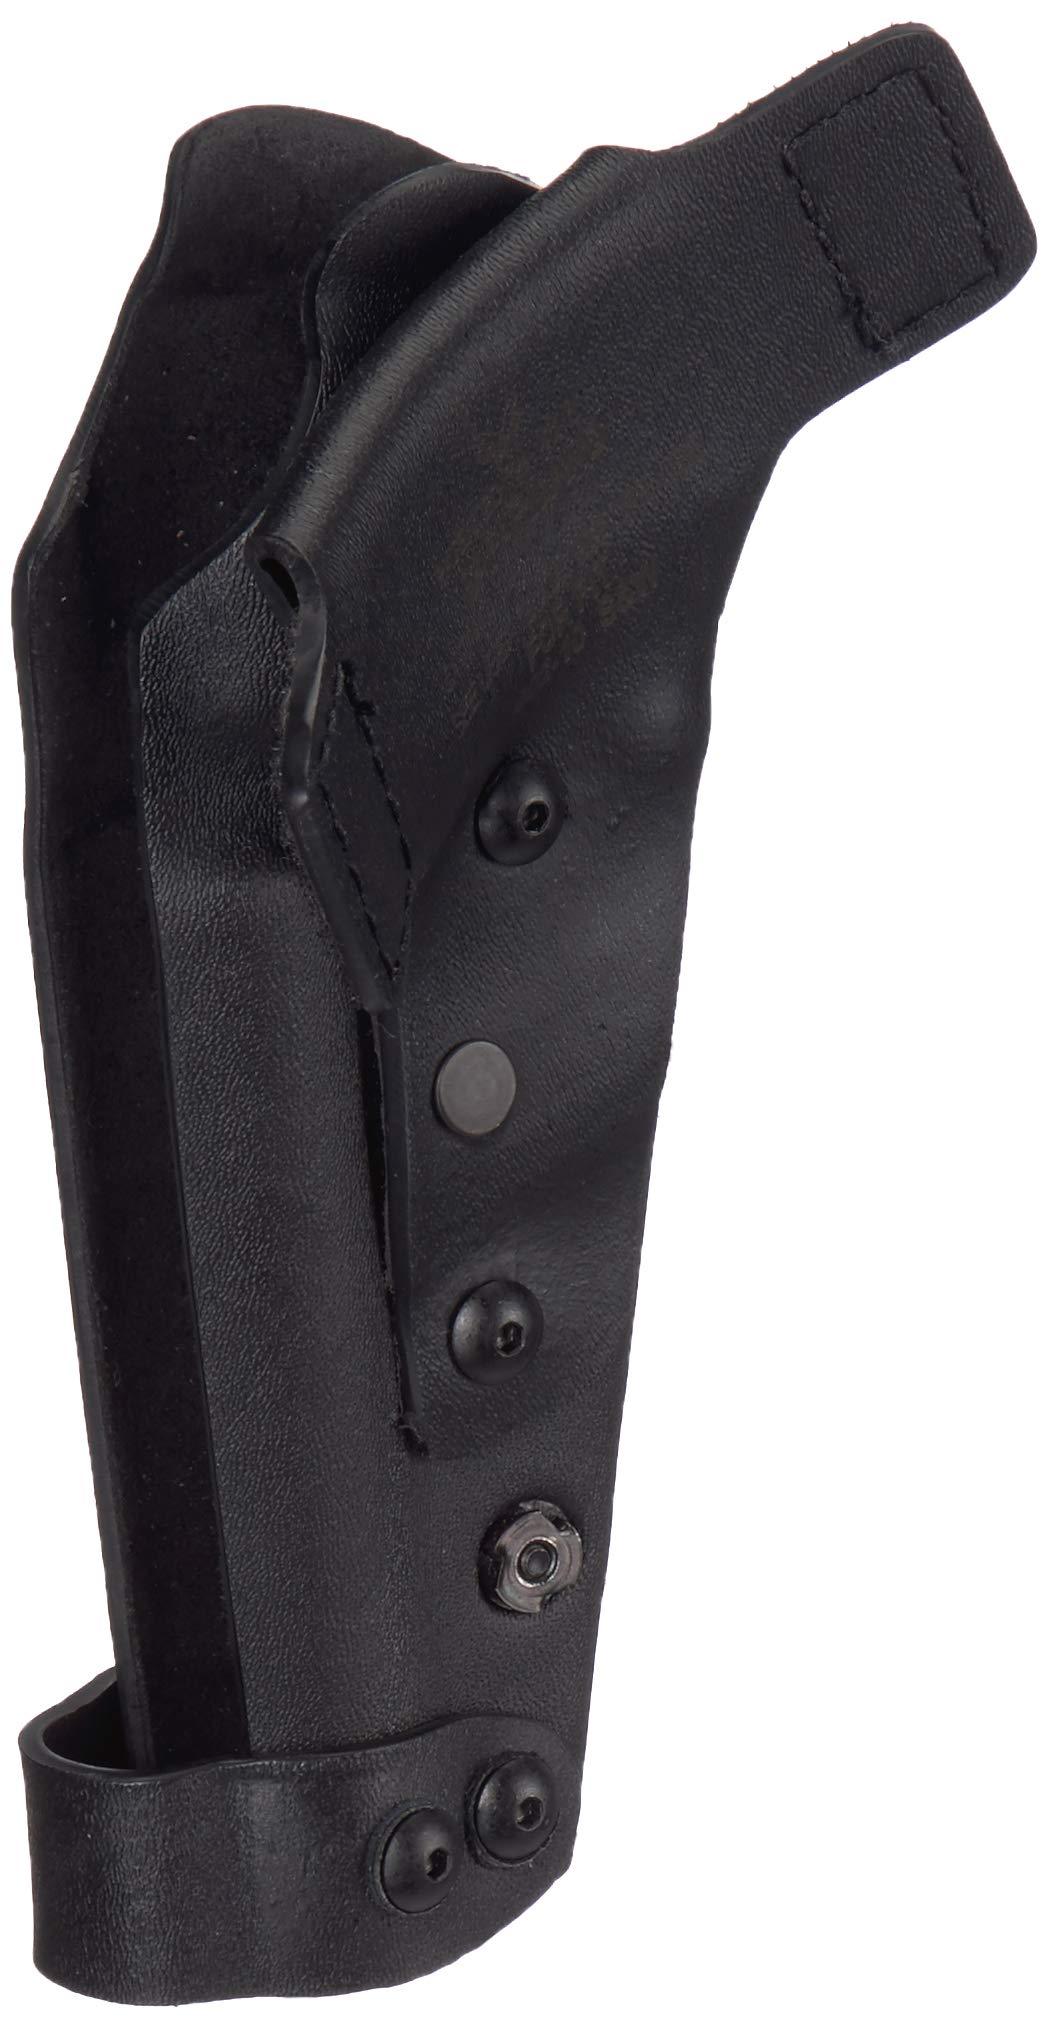 "Safariland 002 S&W K-Frame 6"", STX Tactical, Black, Right Hand"